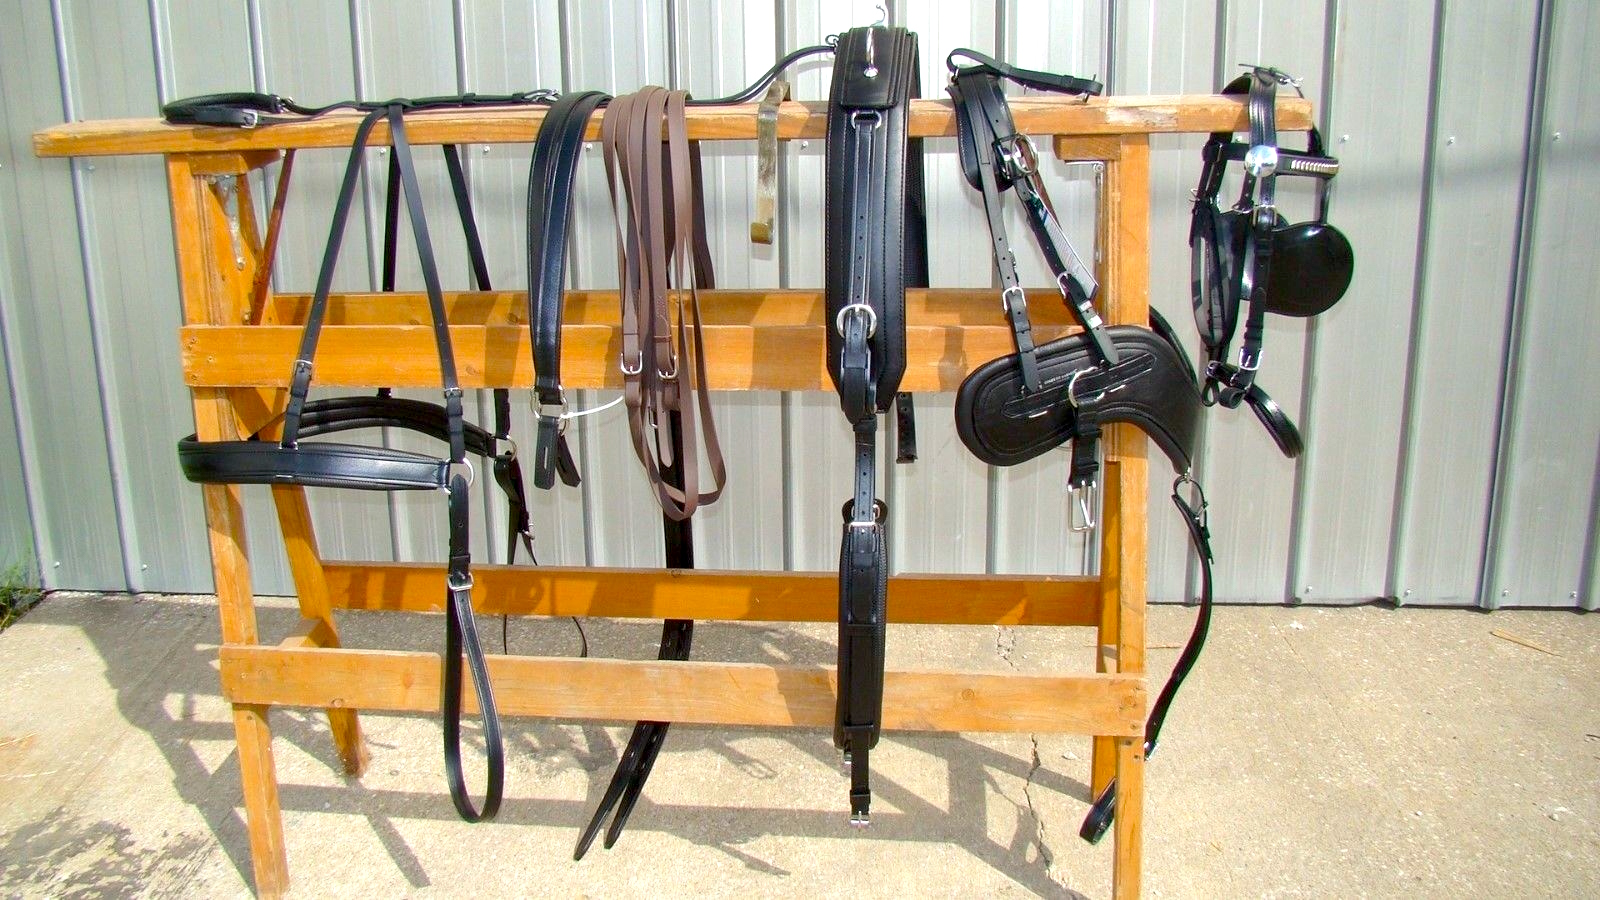 comfyfitupgrade?resize=400%2C400&ssl=1 draft horse harness frontier equestrian draft horse saddle horse